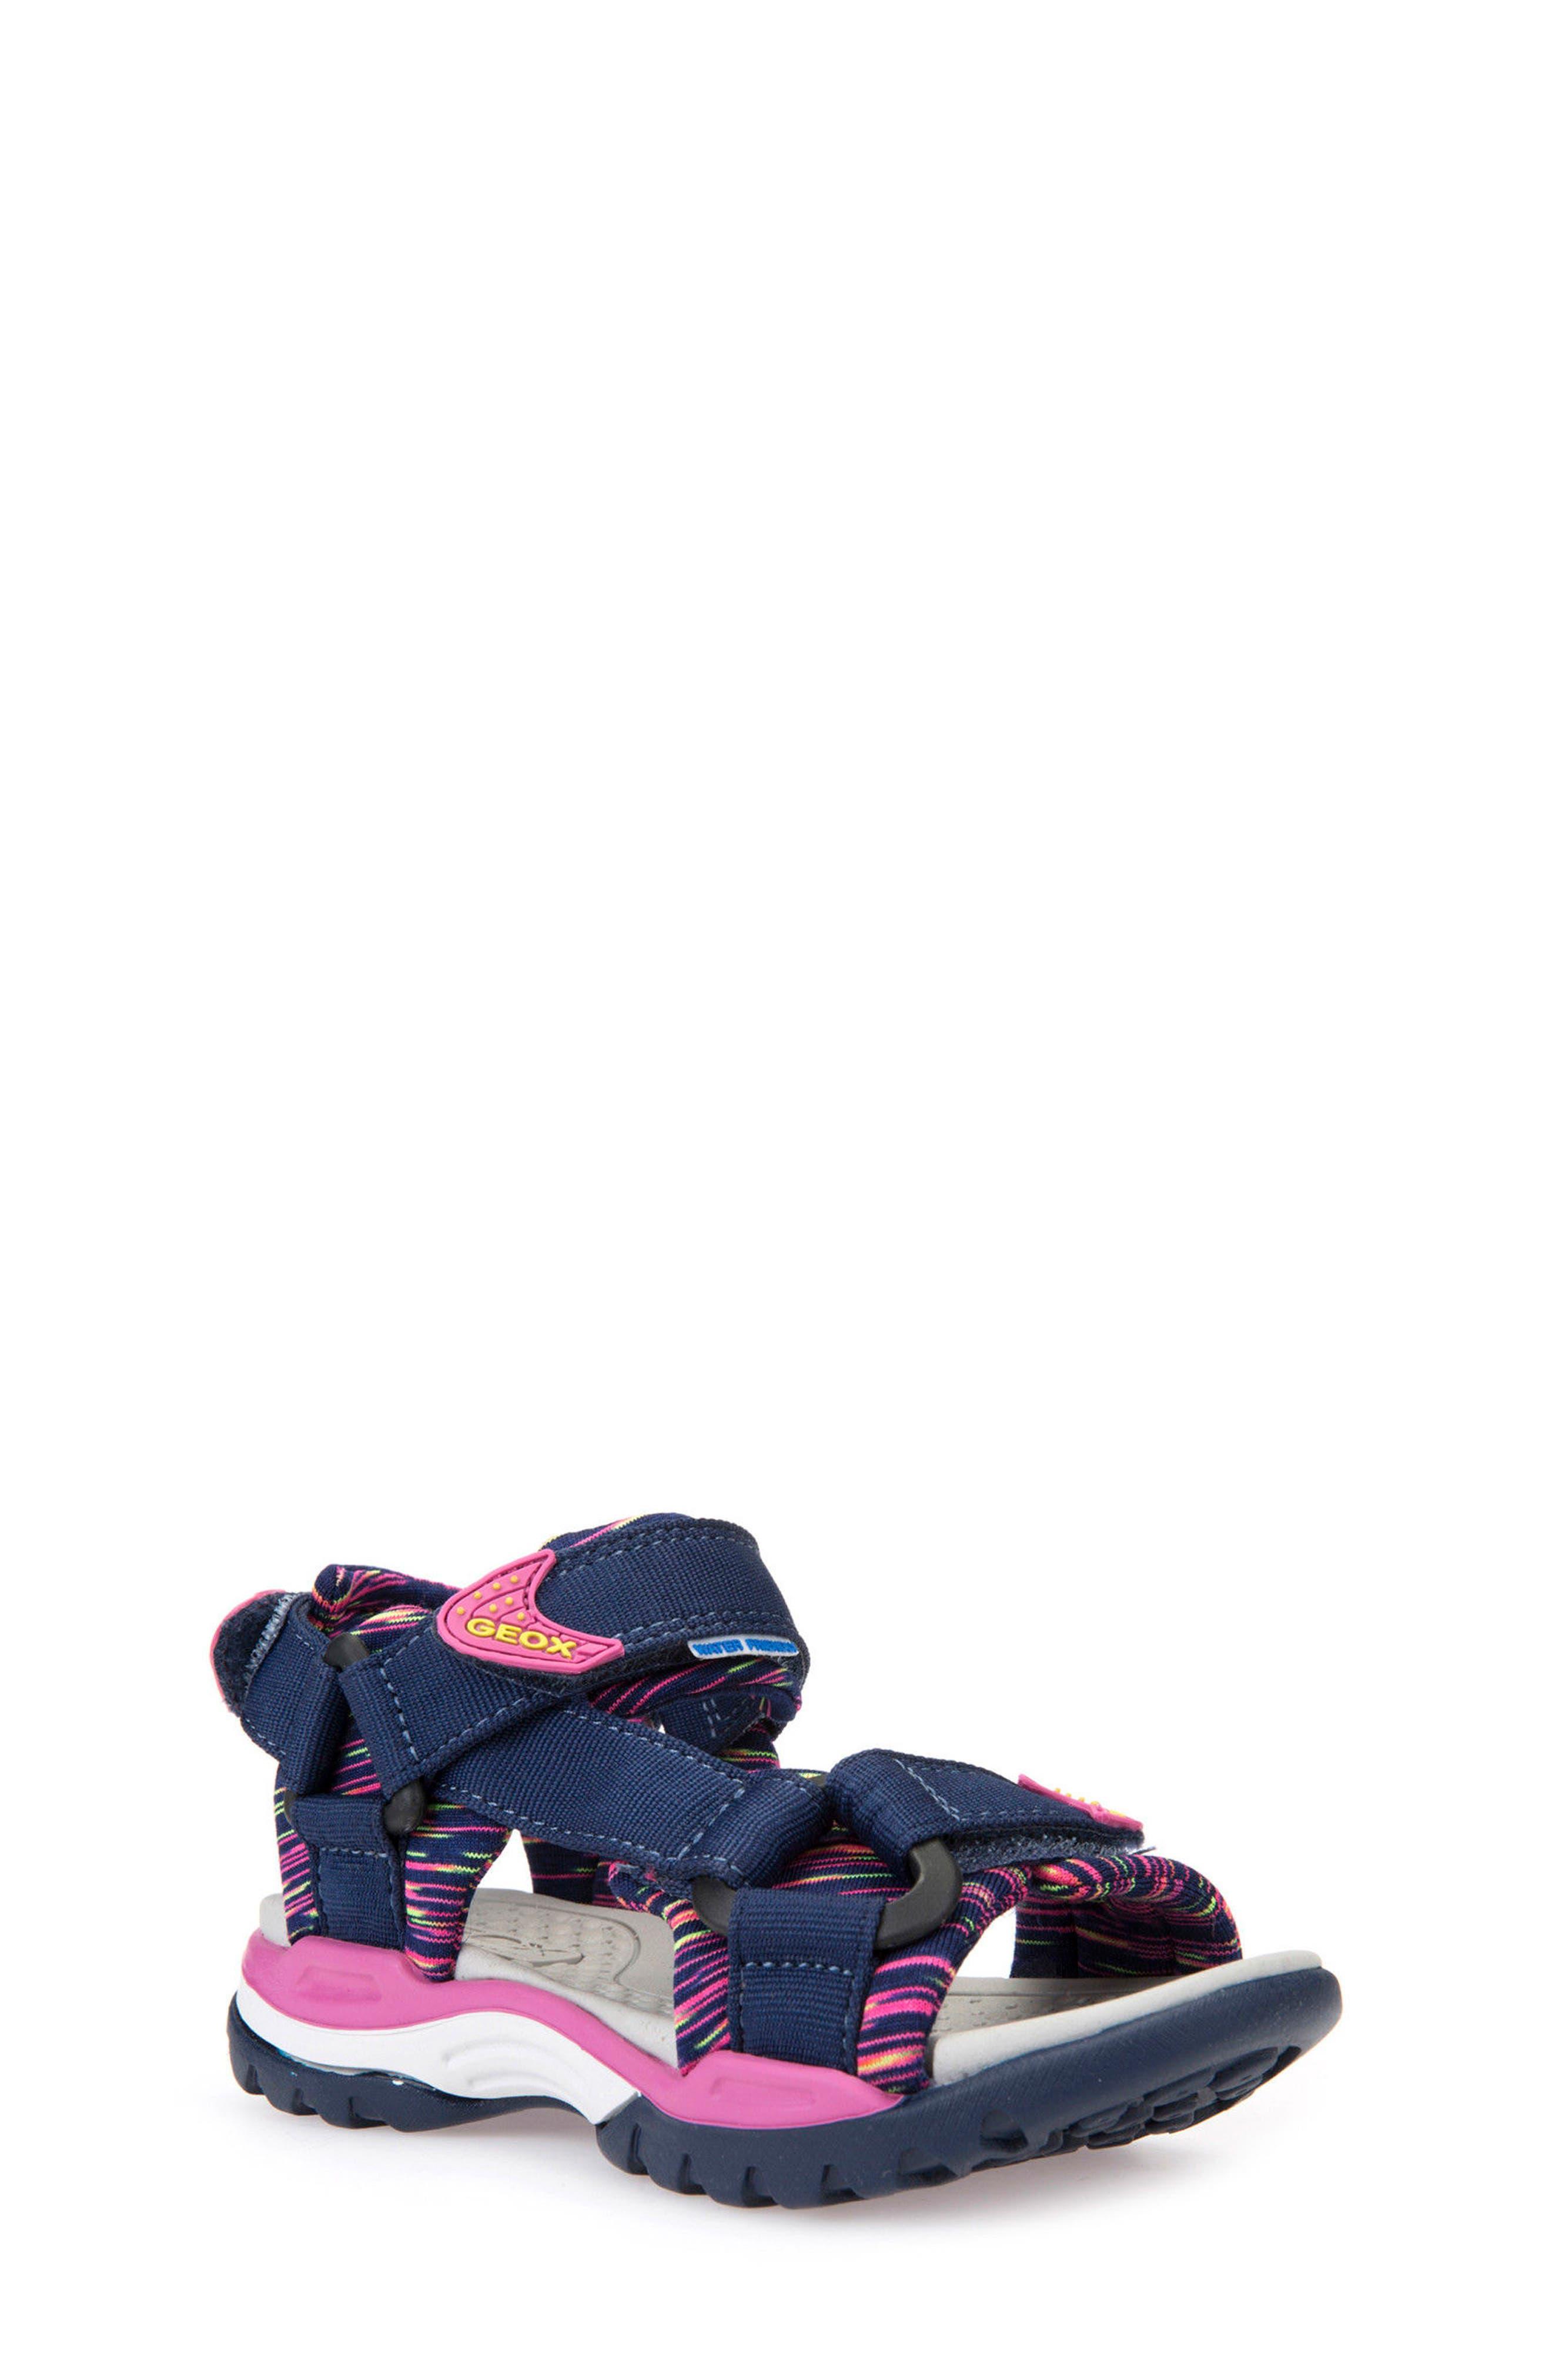 GEOX Borealis Sandal, Main, color, 414